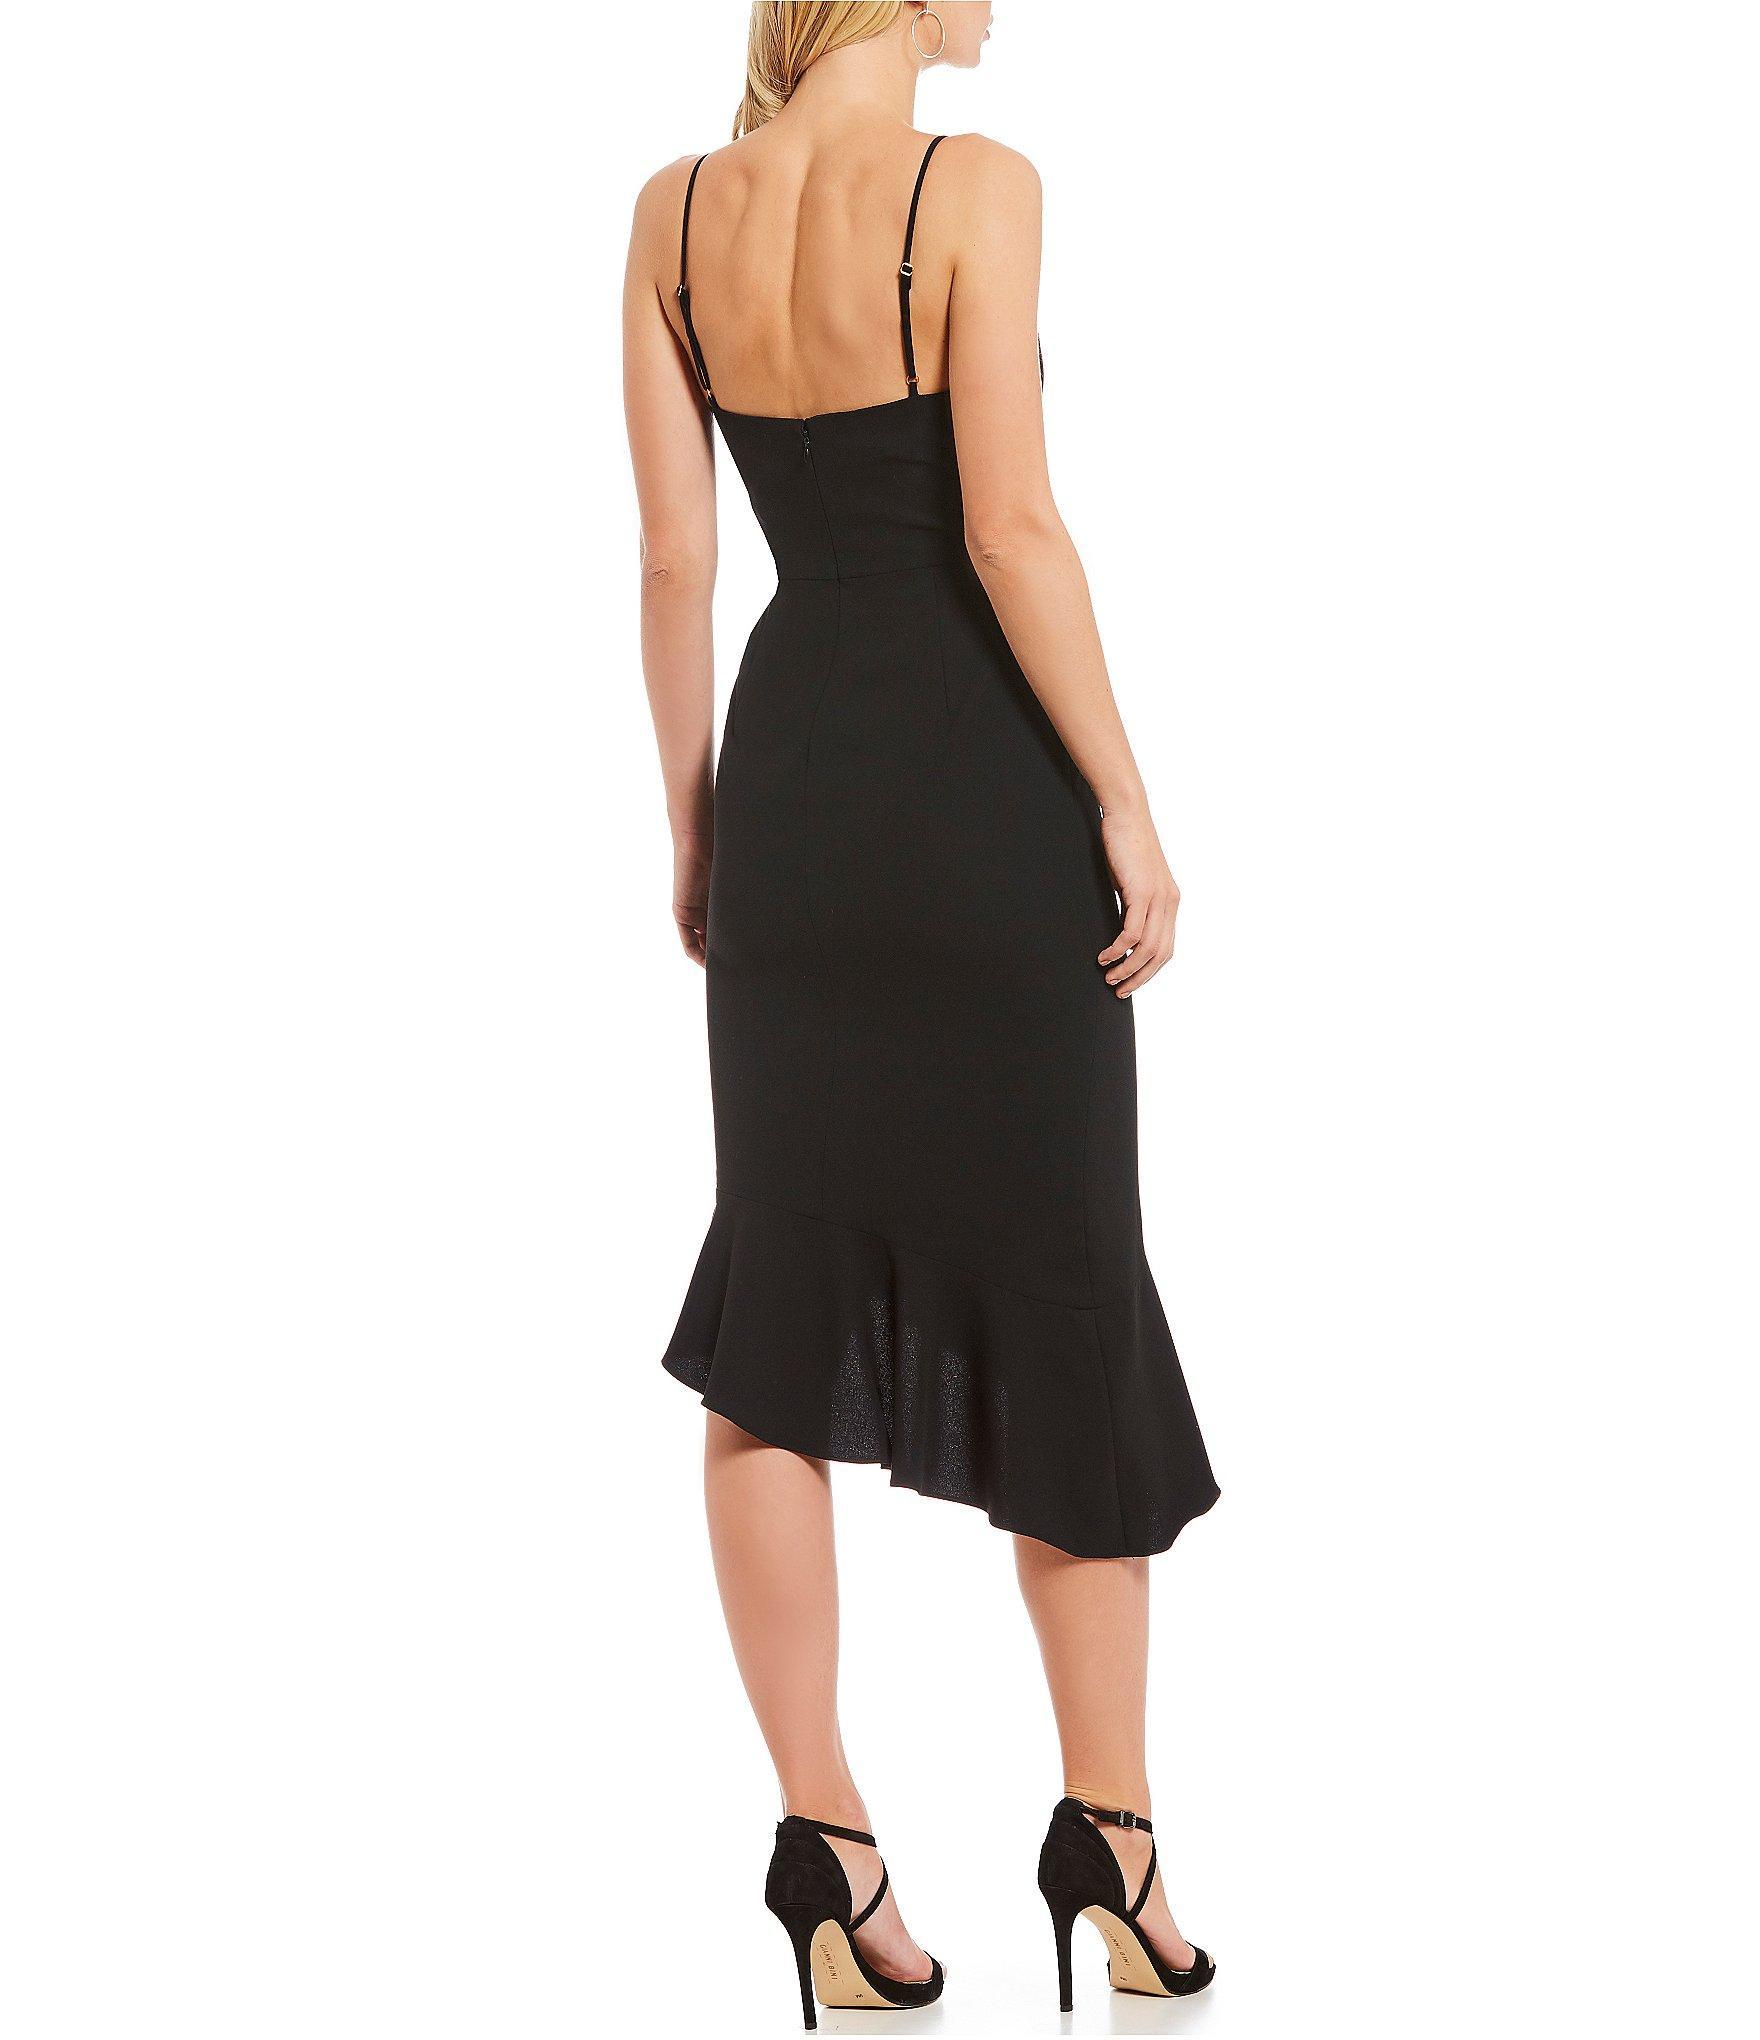 0ff2a22f6d Gianni Bini - Black Lee V-neck Spaghetti Strap Fluted Asymmetric Hem Midi  Sheath Dress. View fullscreen